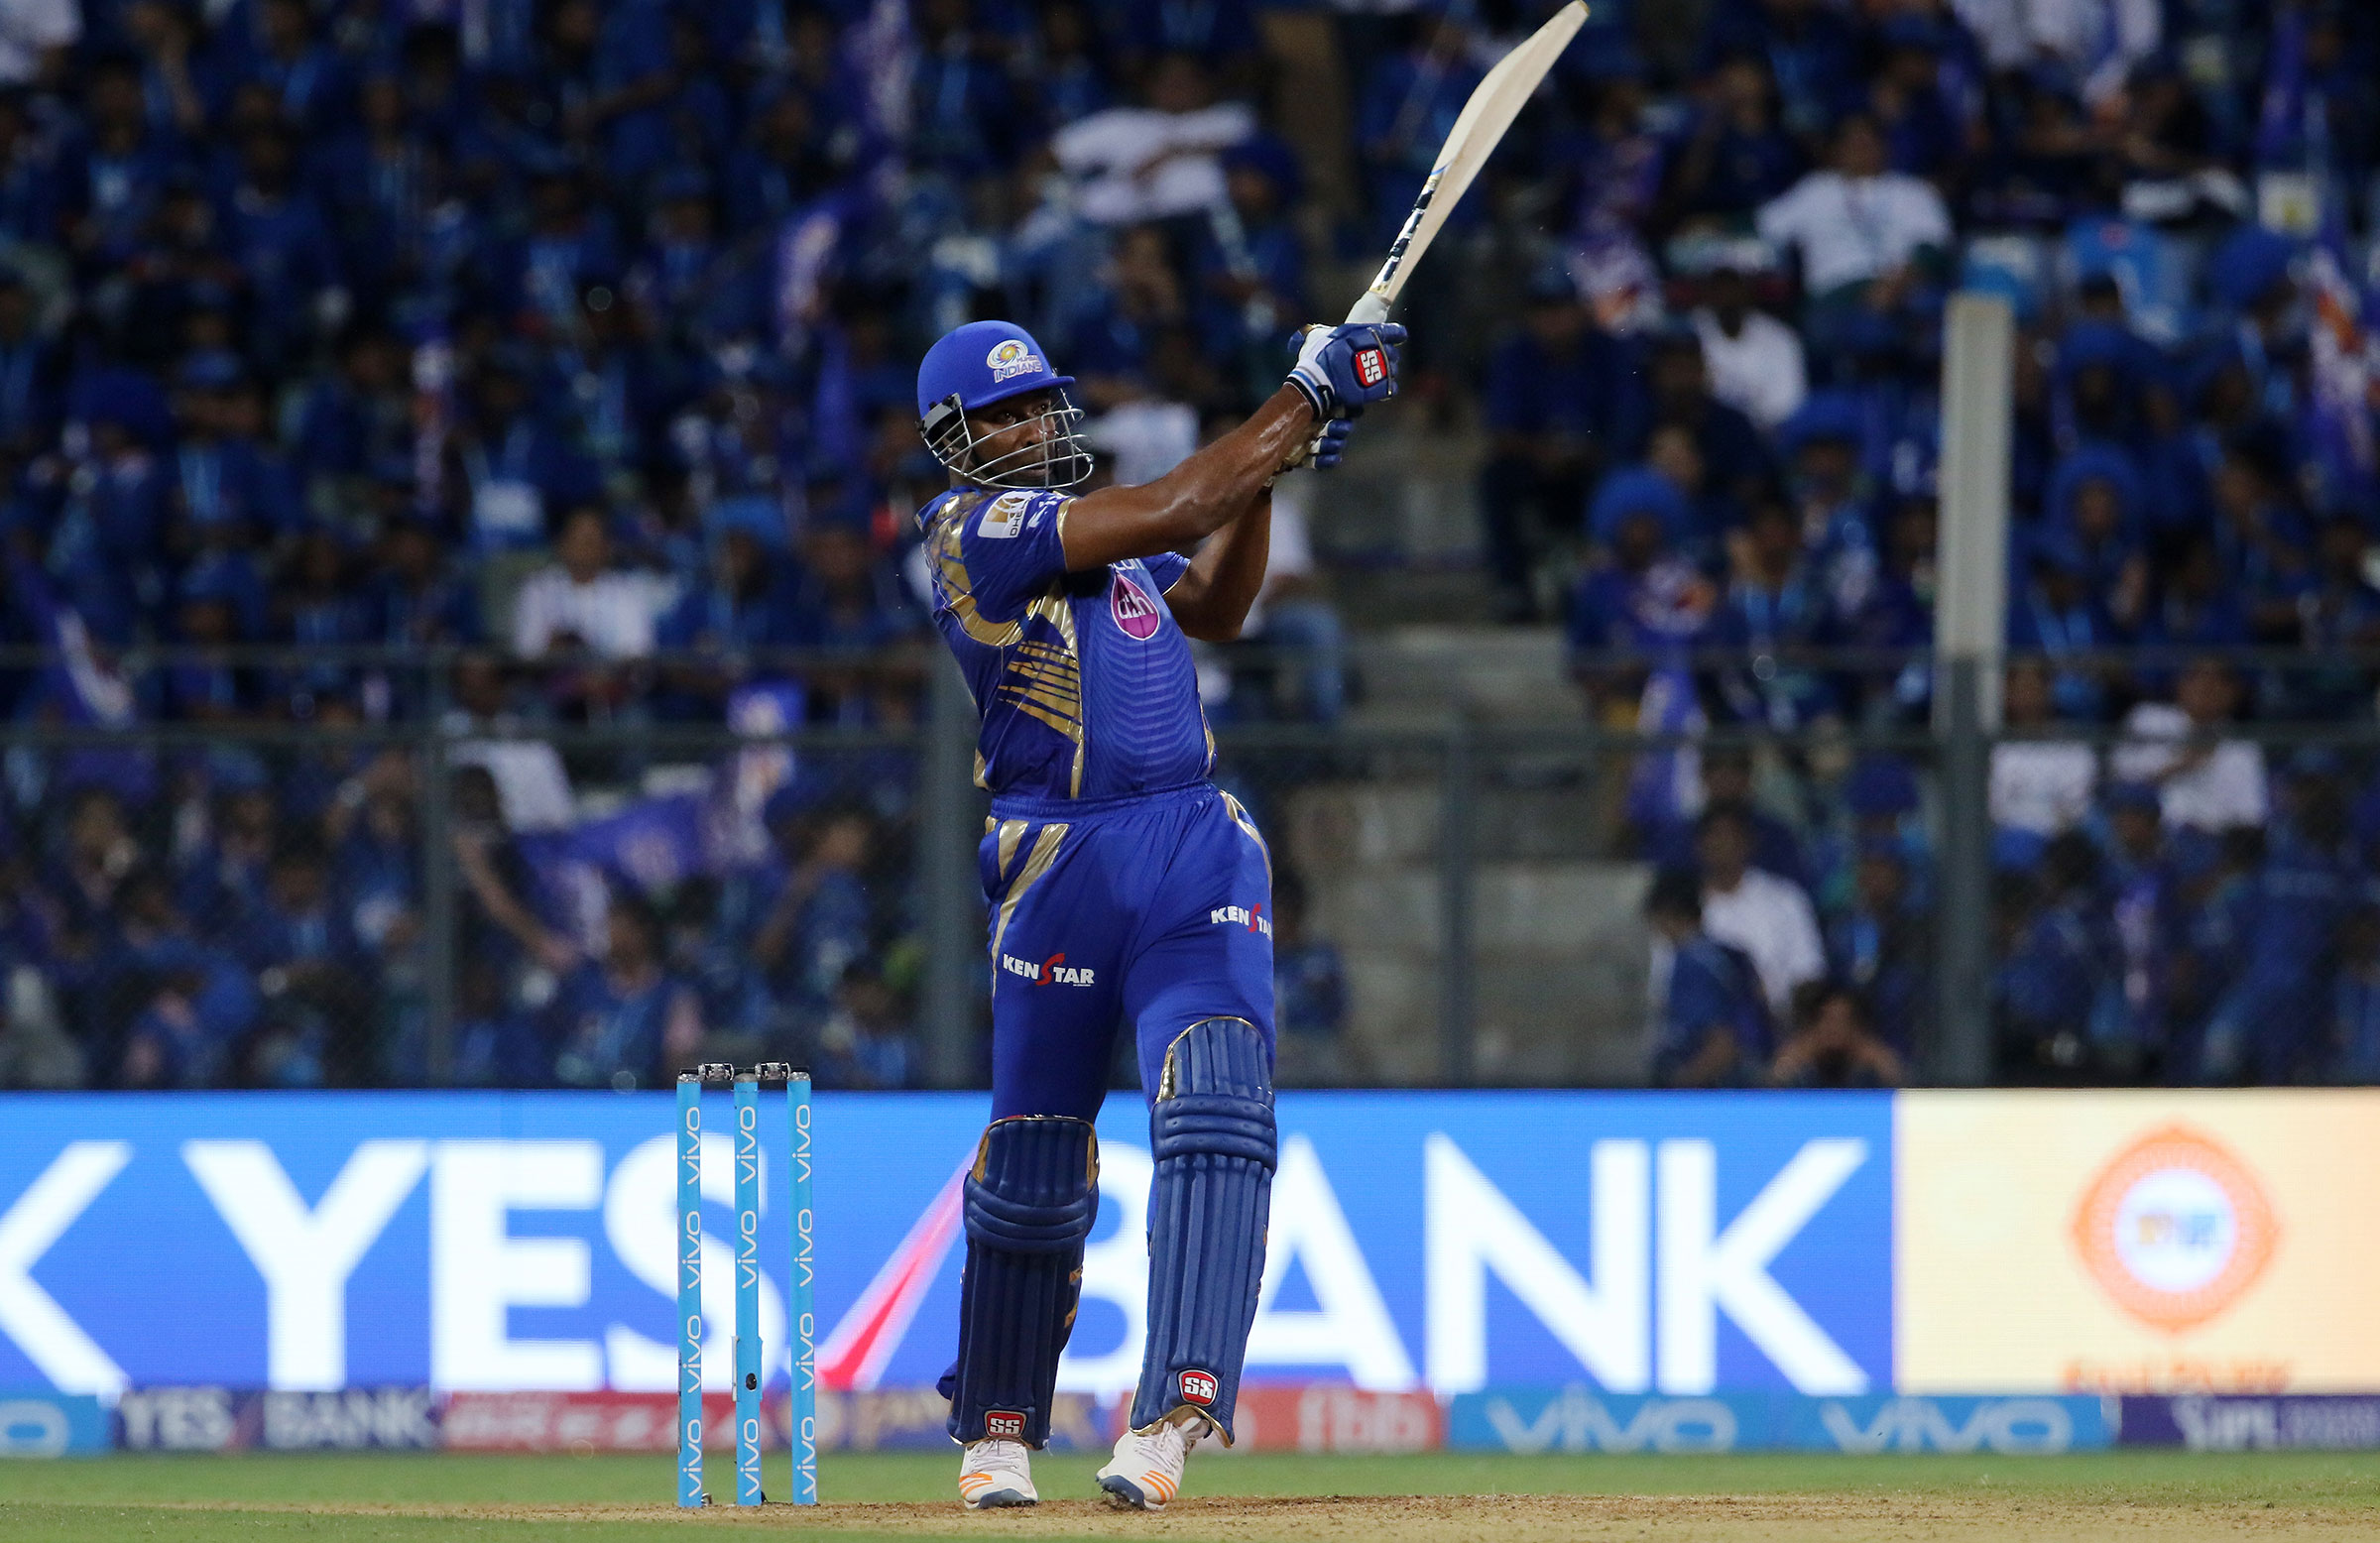 Pollard pulls as he guides Mumbai to victory against Gujarat // BCCI